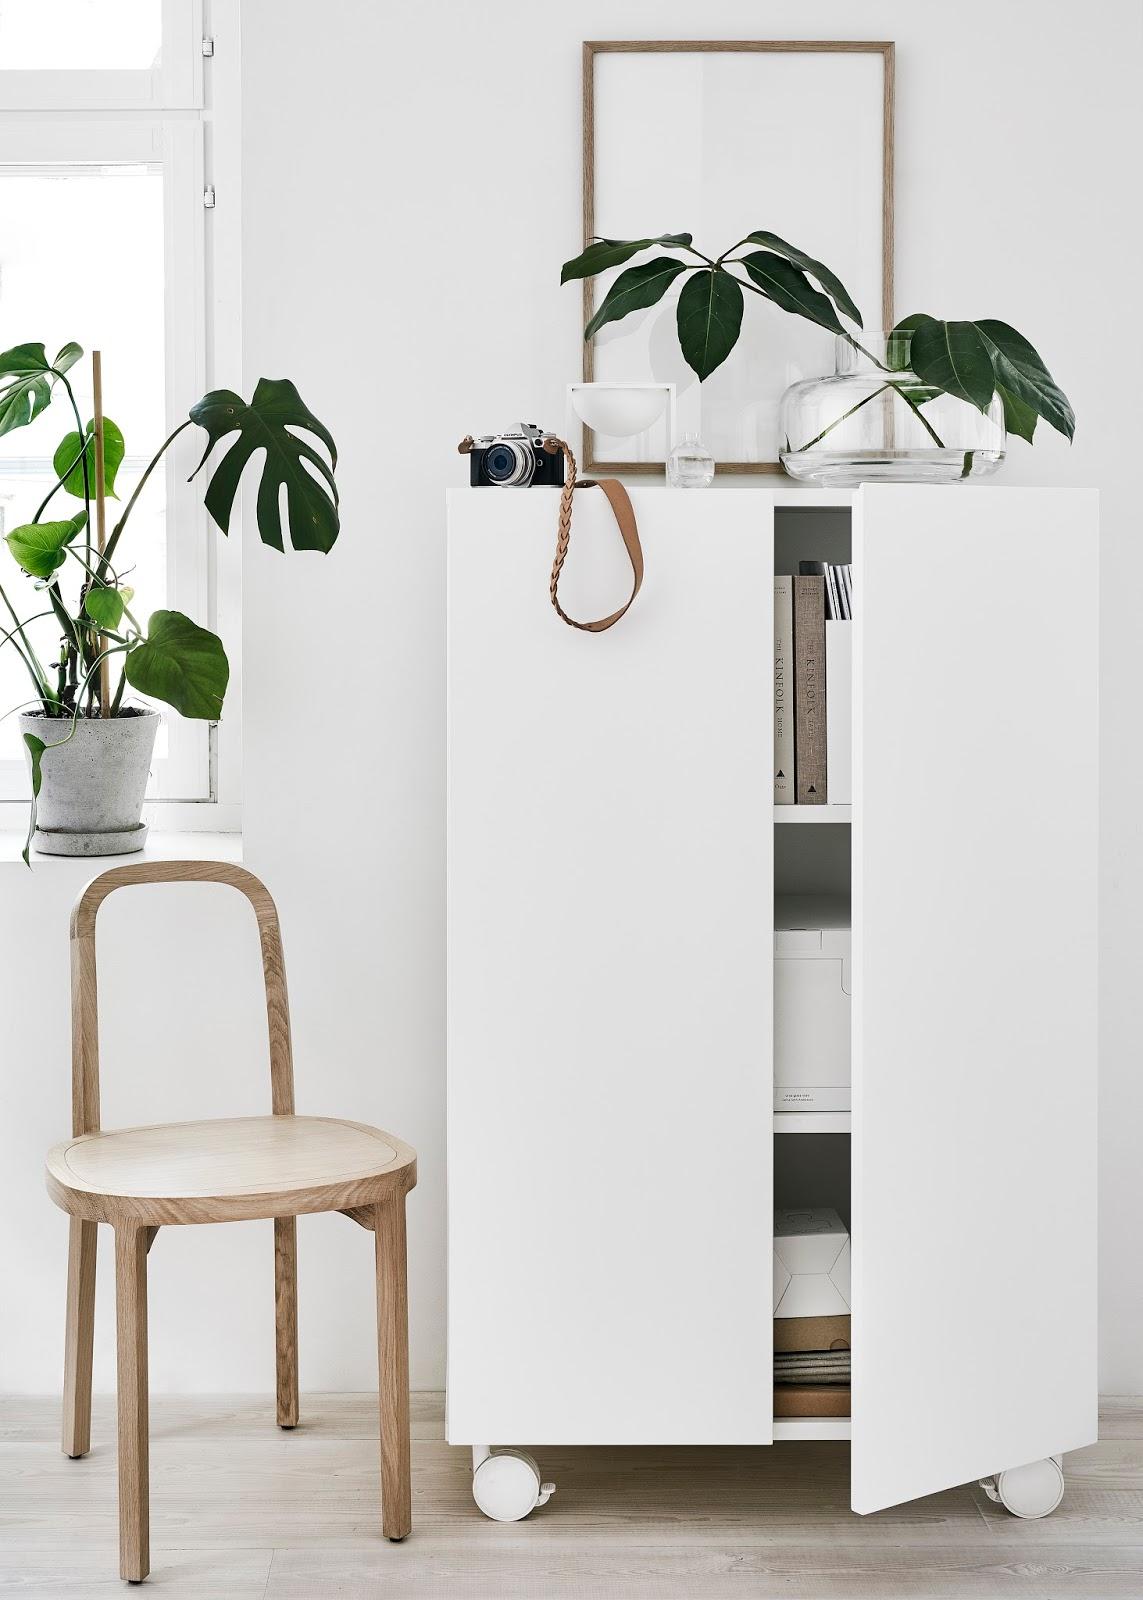 Finnish Design Shop 24:7 collection cupboard, Siro chair by Woodnotes and Marimekko Urna vase. Styling and photo Riikka Kantikoski